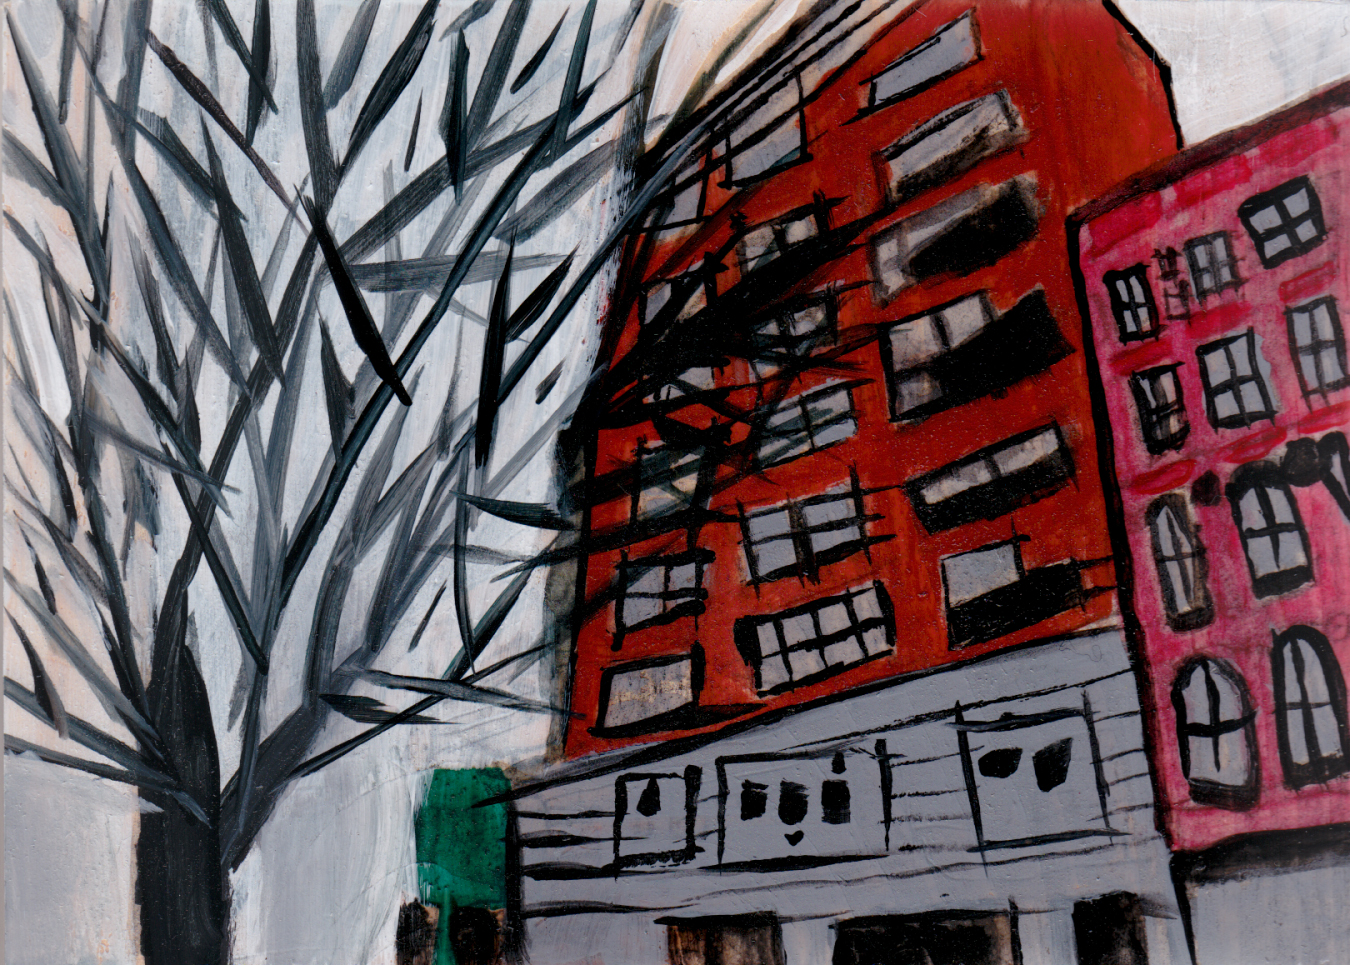 Jazmin_cityscape painting_01.jpg